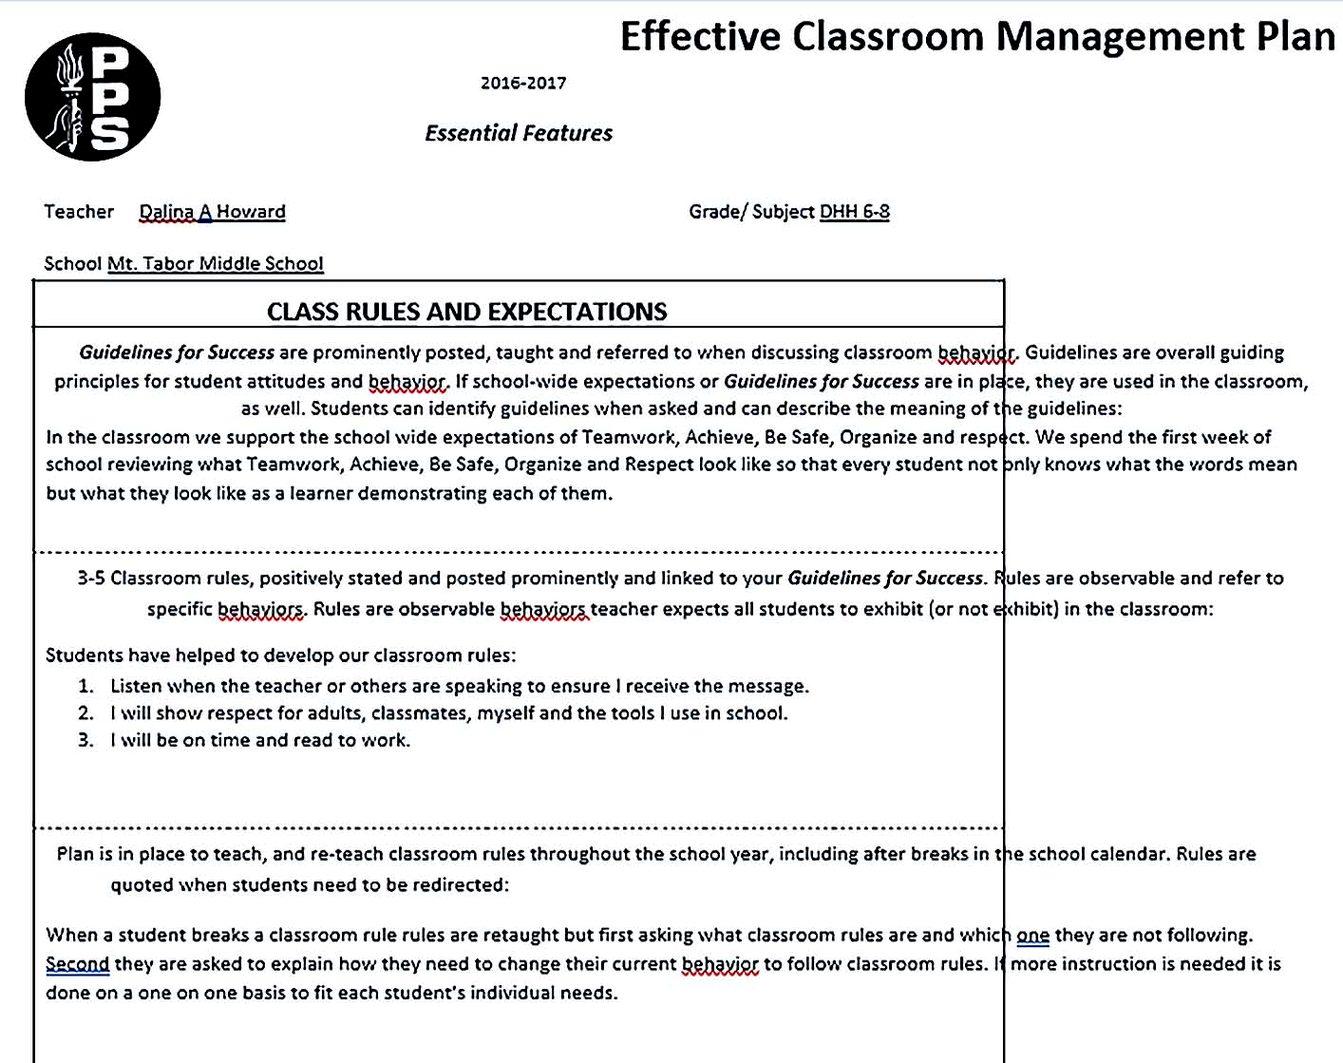 Effective Classroom Management Plan